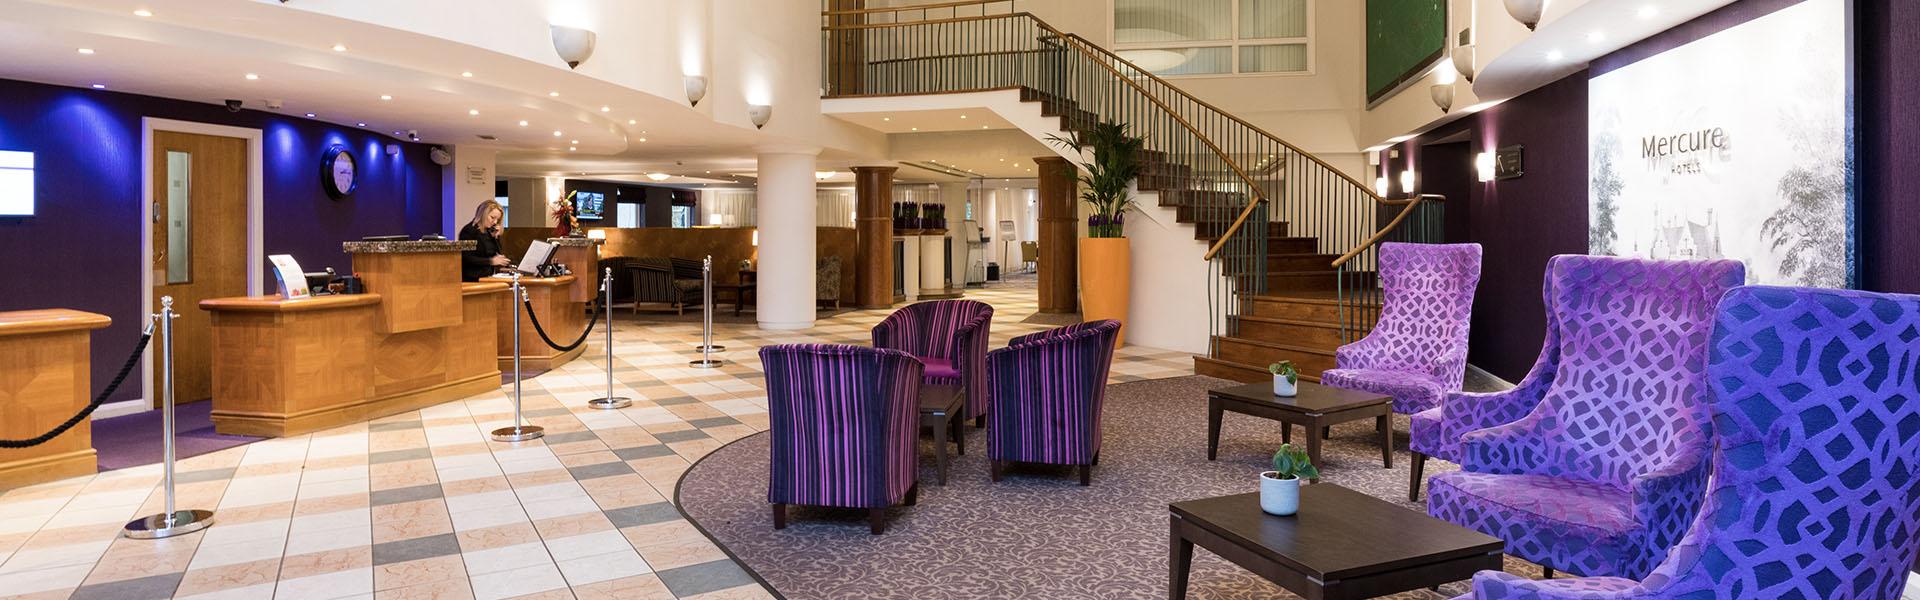 Mercure Sheffield Kenwood Hall Hotel & Spa Vine Hotel Management